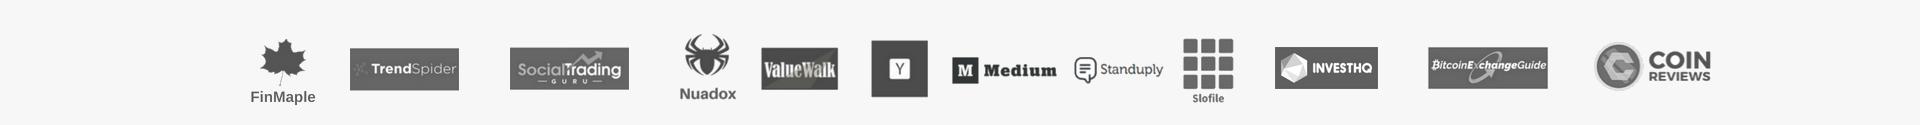 Press Logos Banner Hashtag Investing.png